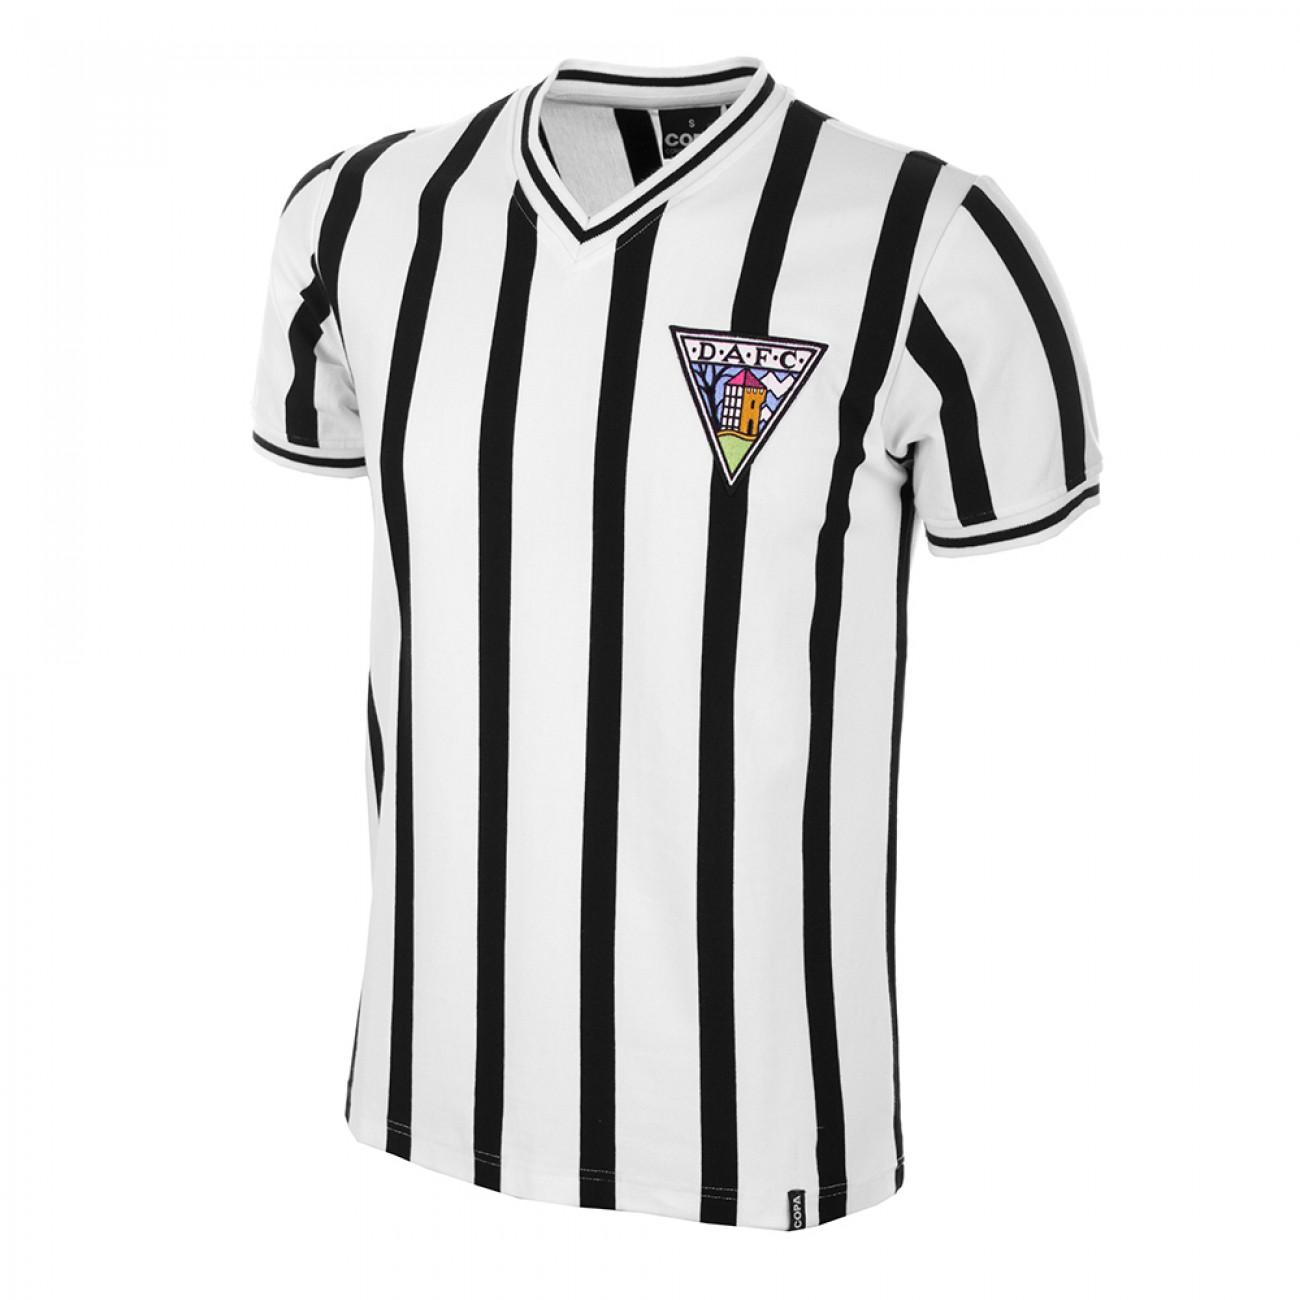 http://www.retrofootball.es/ropa-de-futbol/camiseta-dunfermline-a-os-96.html